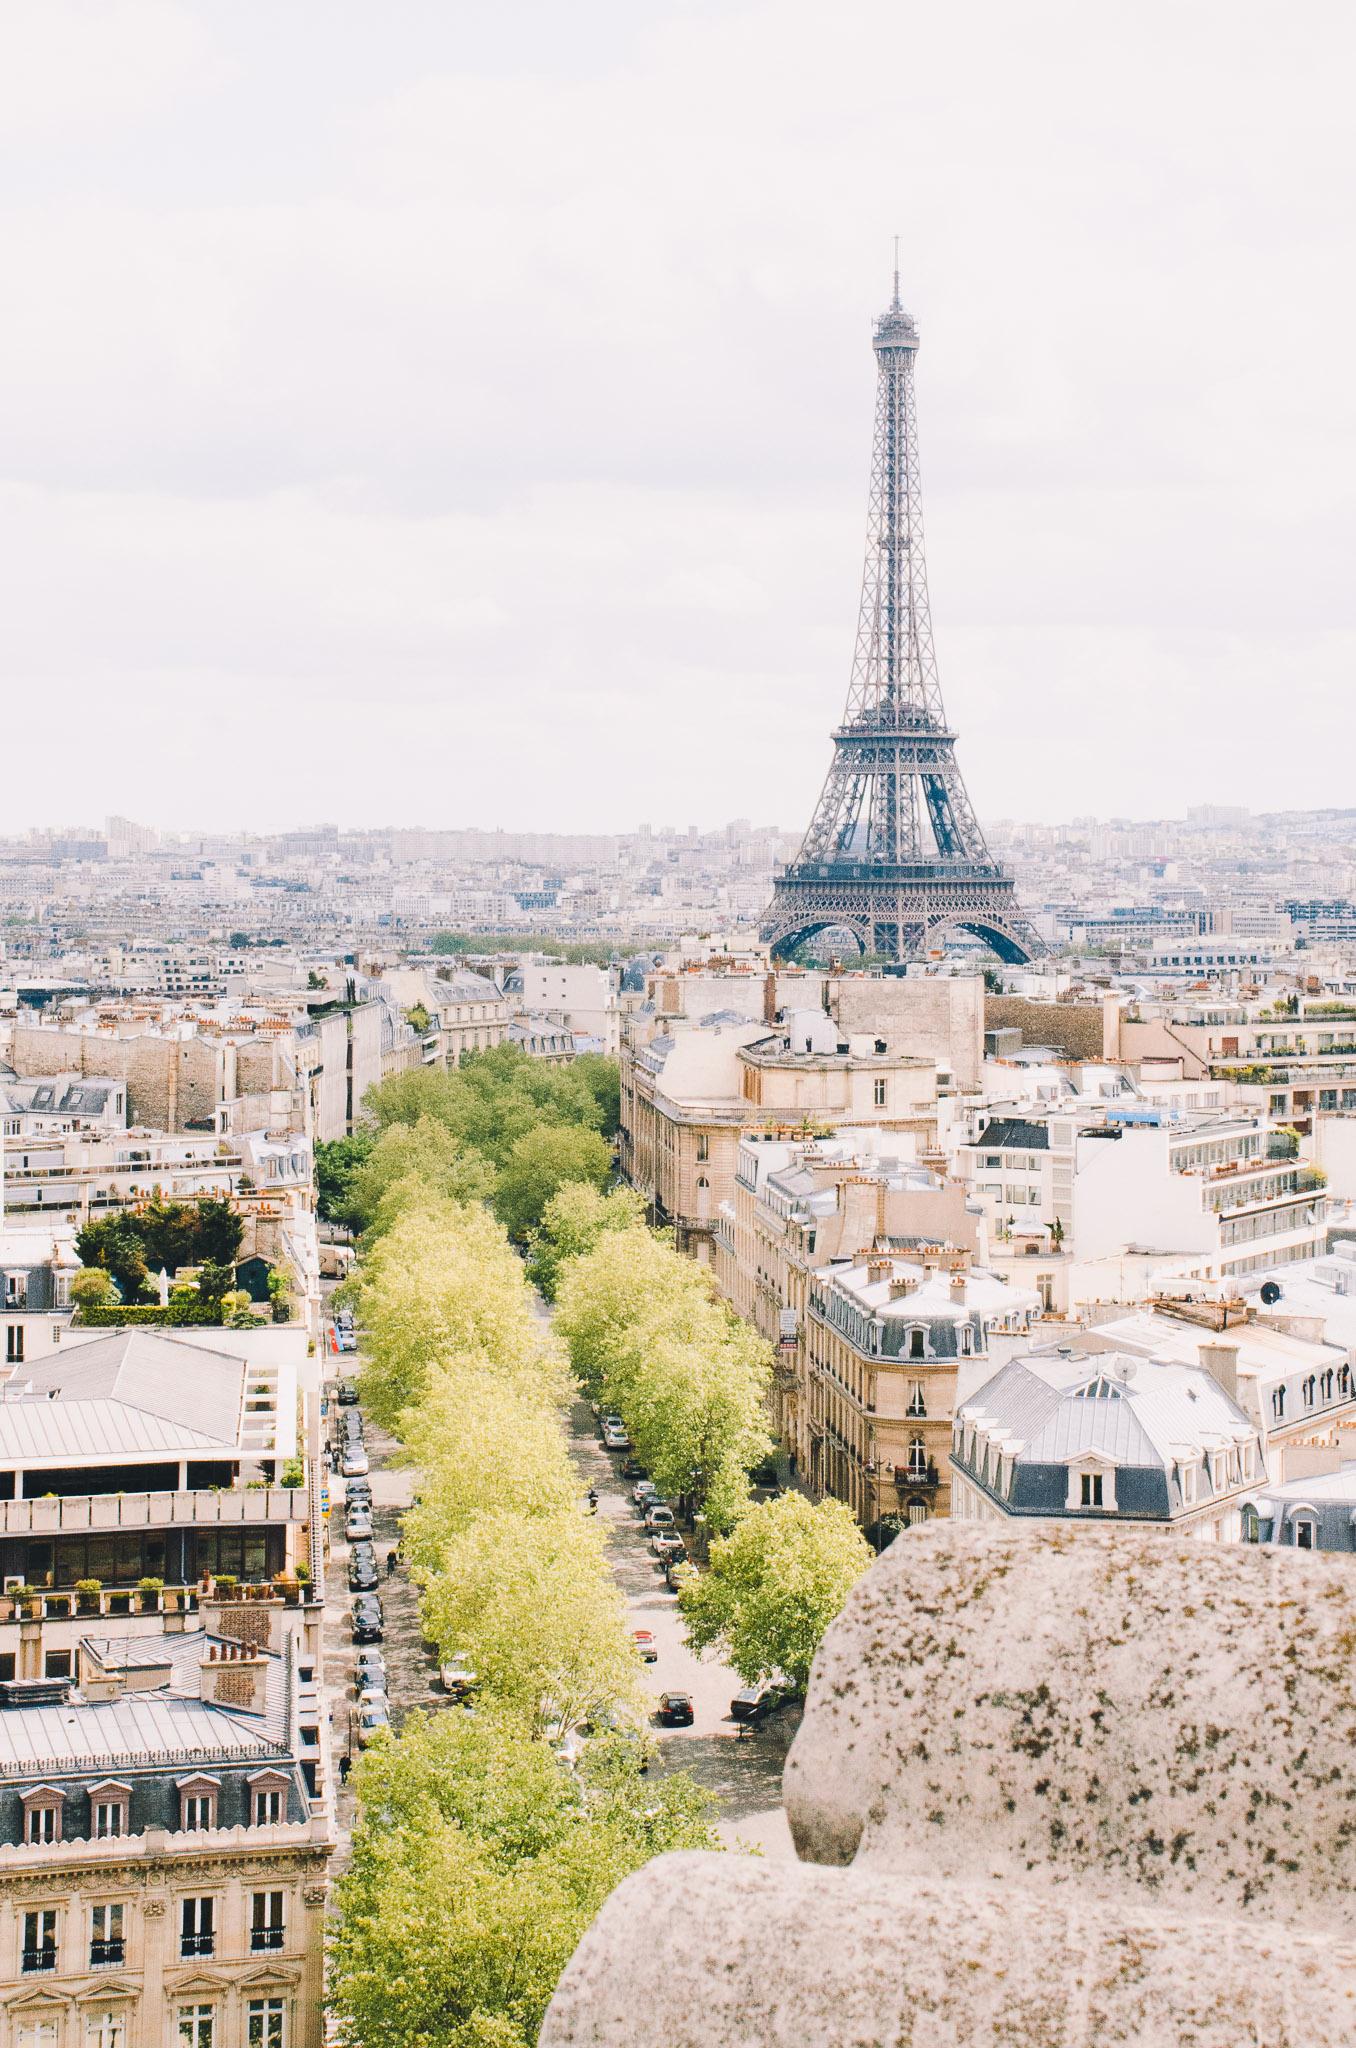 france-paris-2013-7-eiffel-tower.jpg